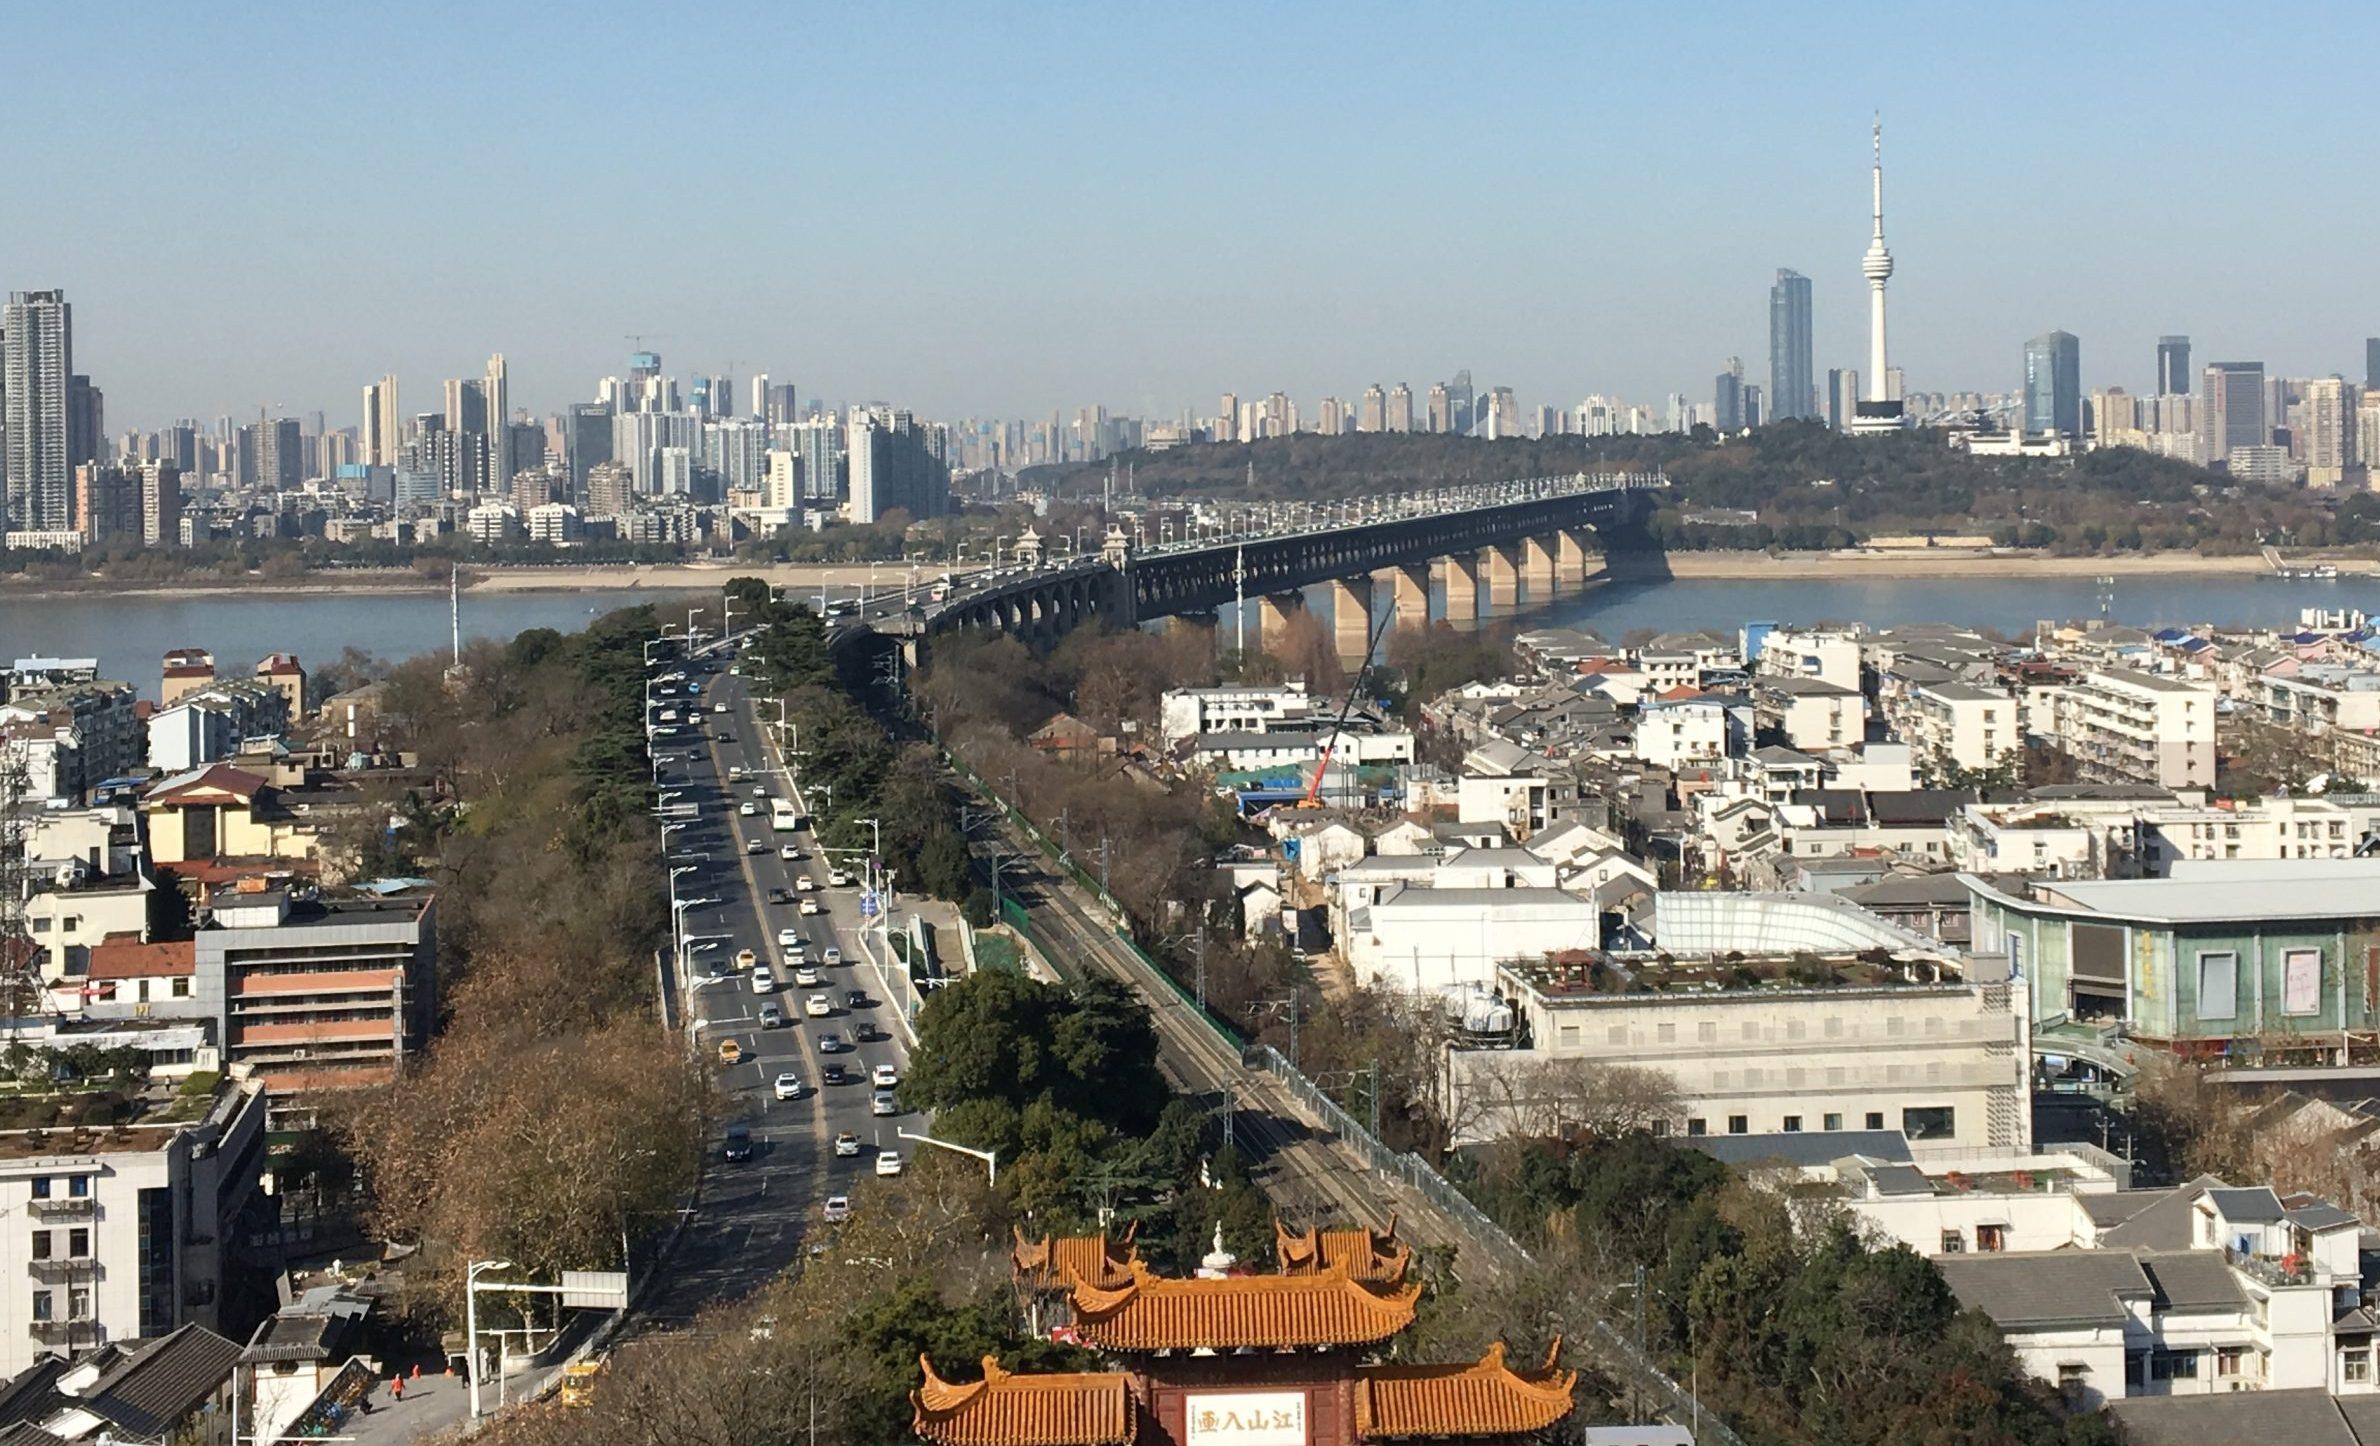 Millionbyen Wuhan ligger ved Yangtze-floden. Wikipediafoto: ZhengZhou.